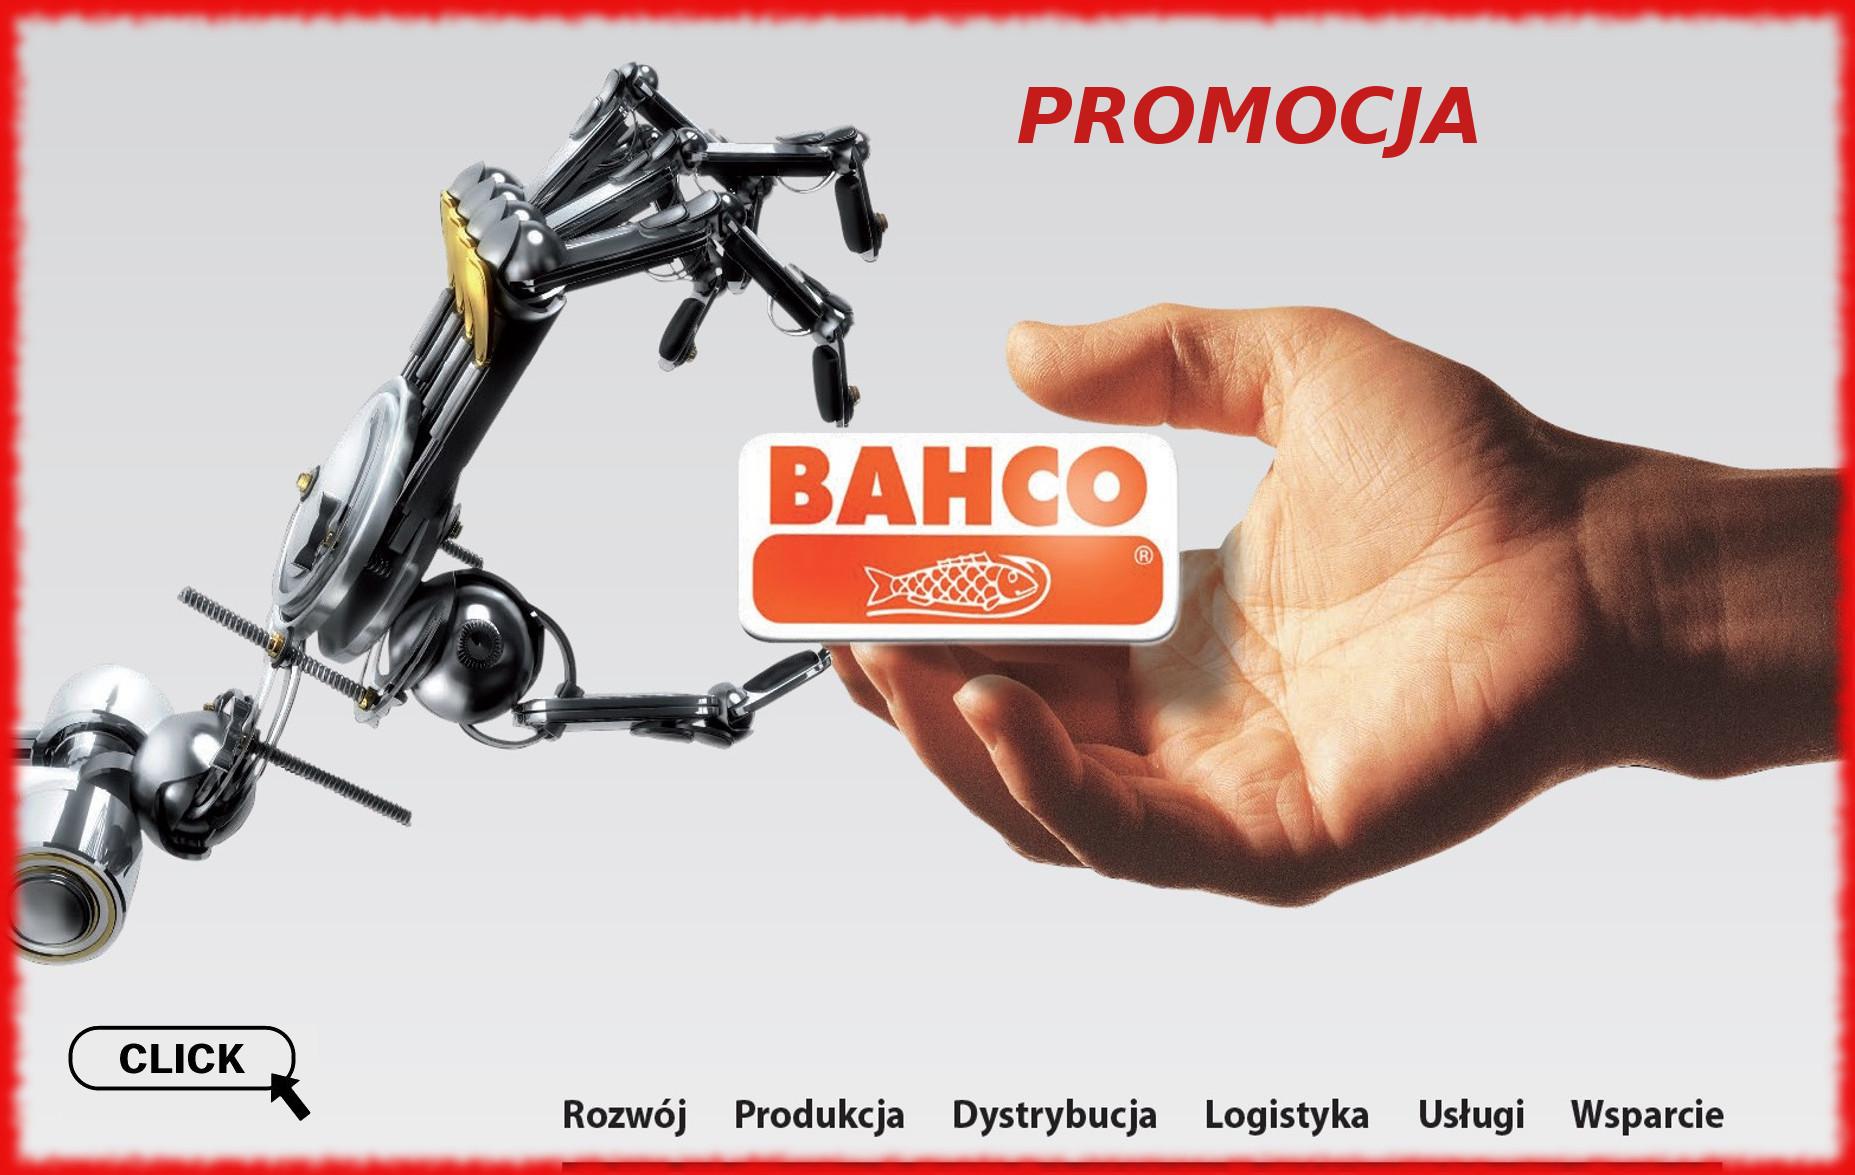 bahco-promo